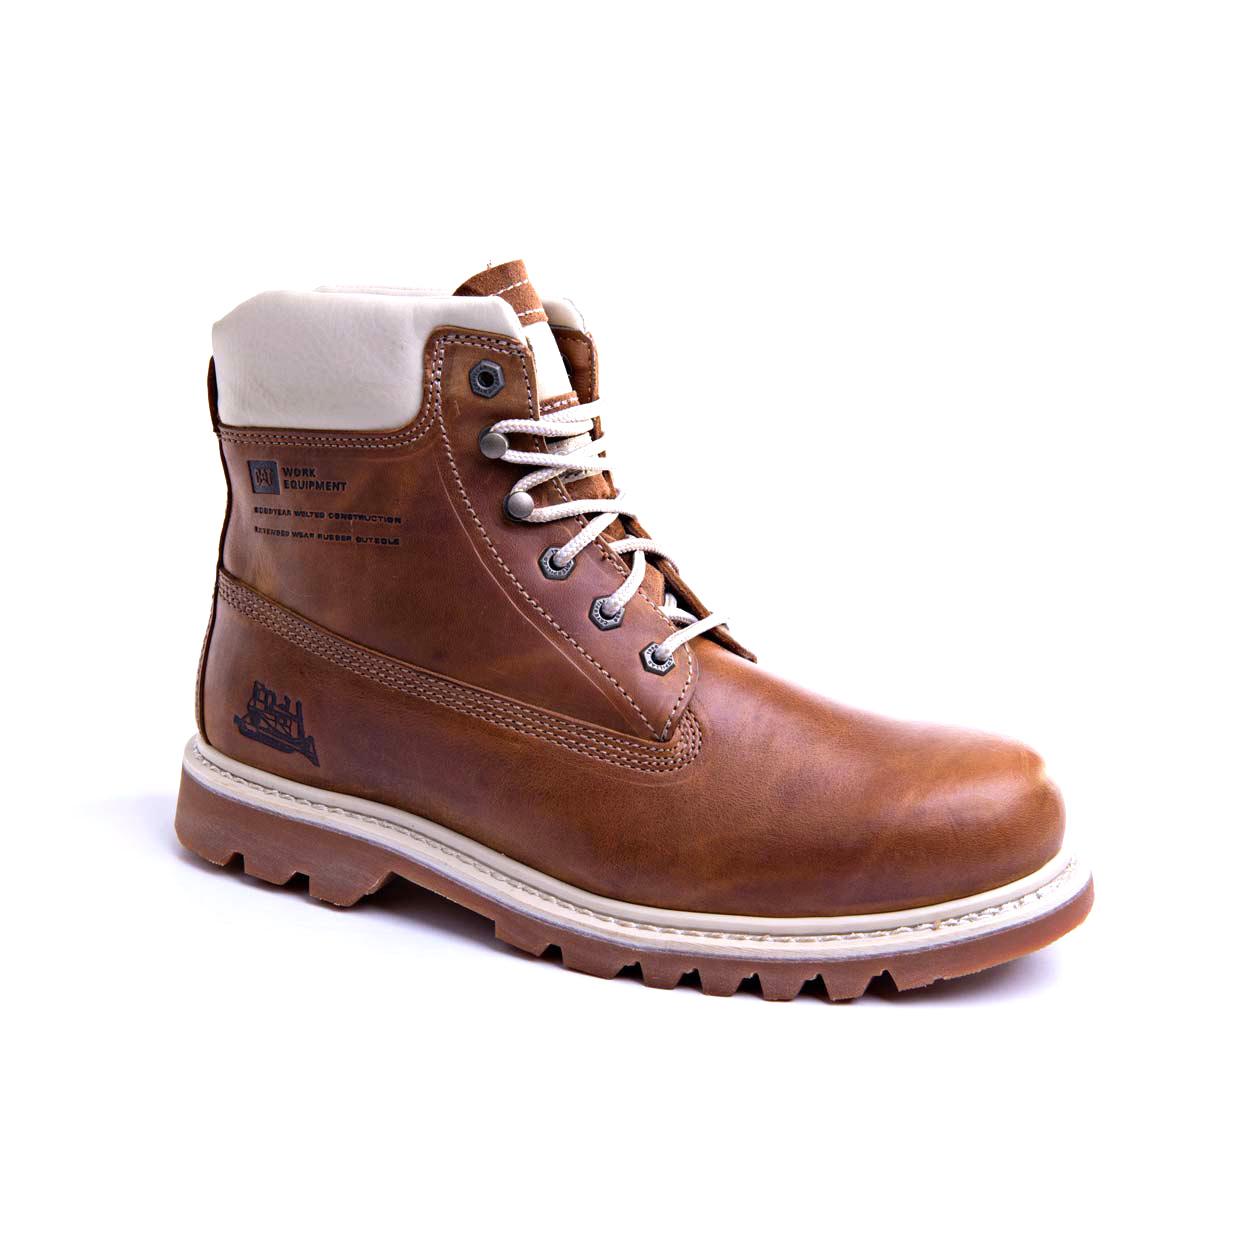 7699f7aa Bruiser - Golden brown - Mens - CAT Footwear